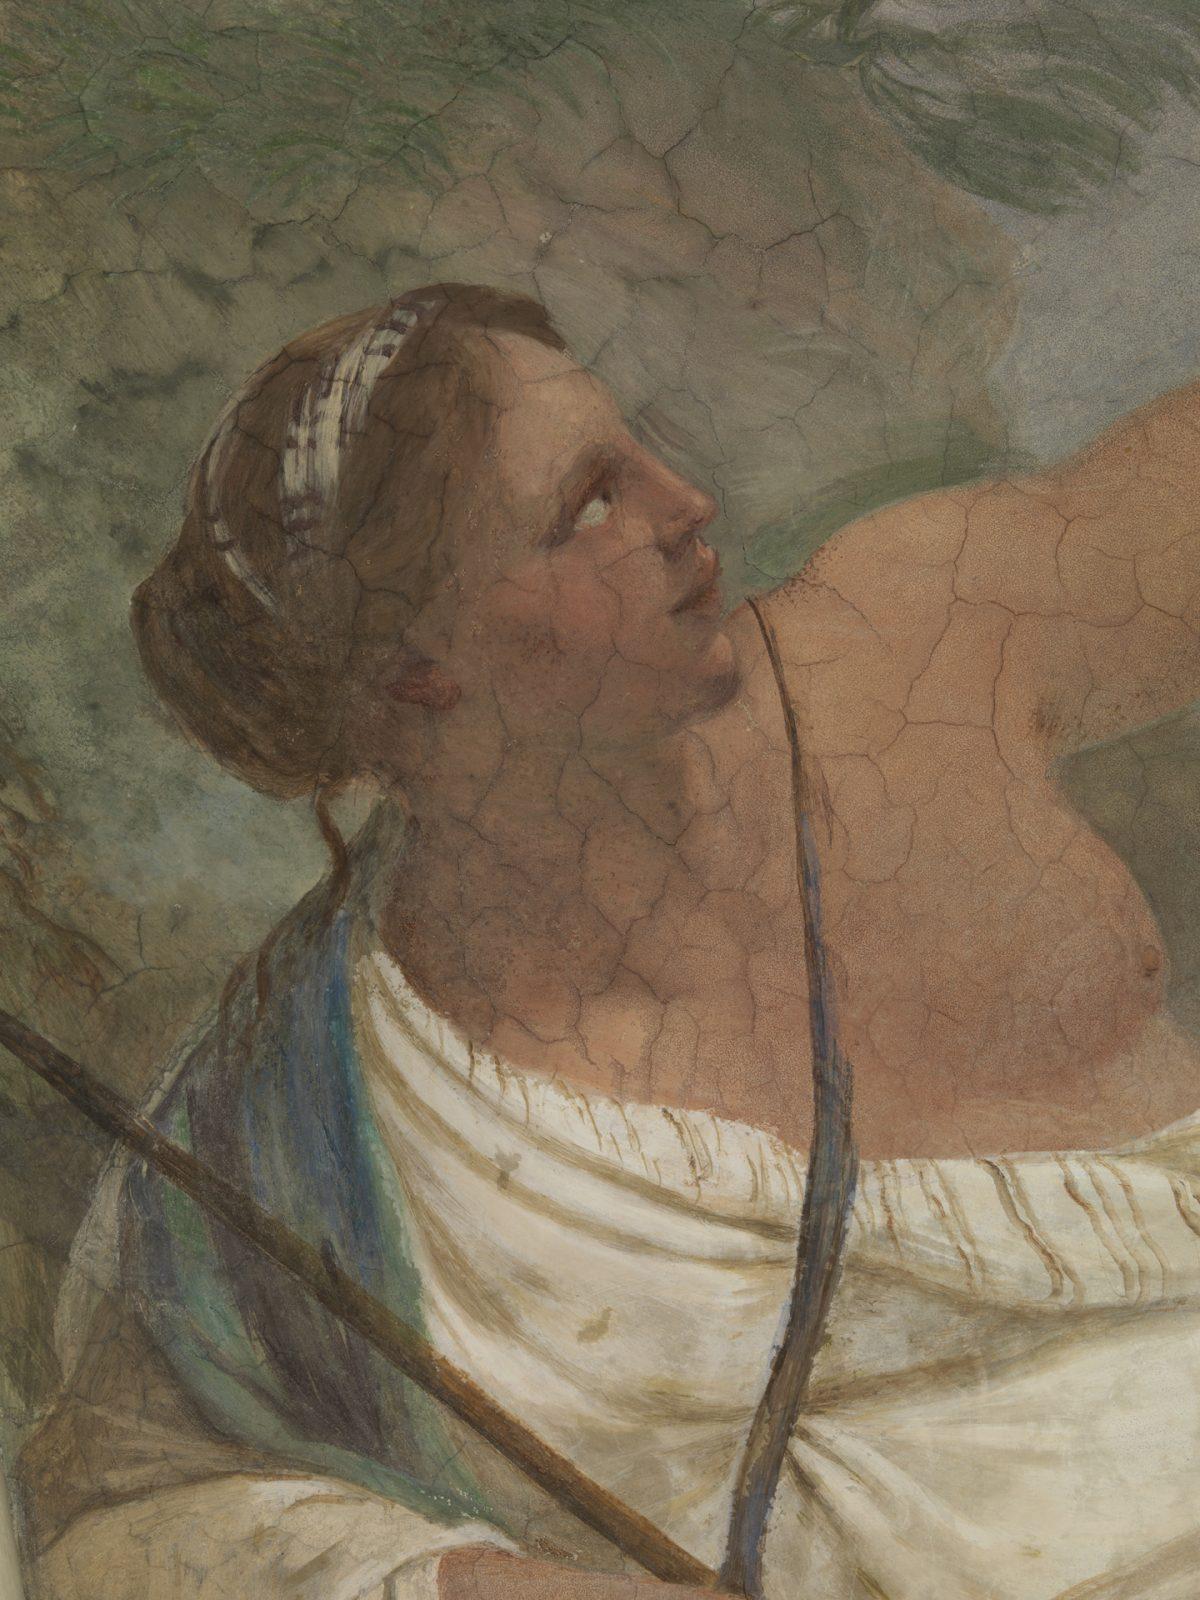 MUSEO DI PALAZZO DORIA PAMPHILJ